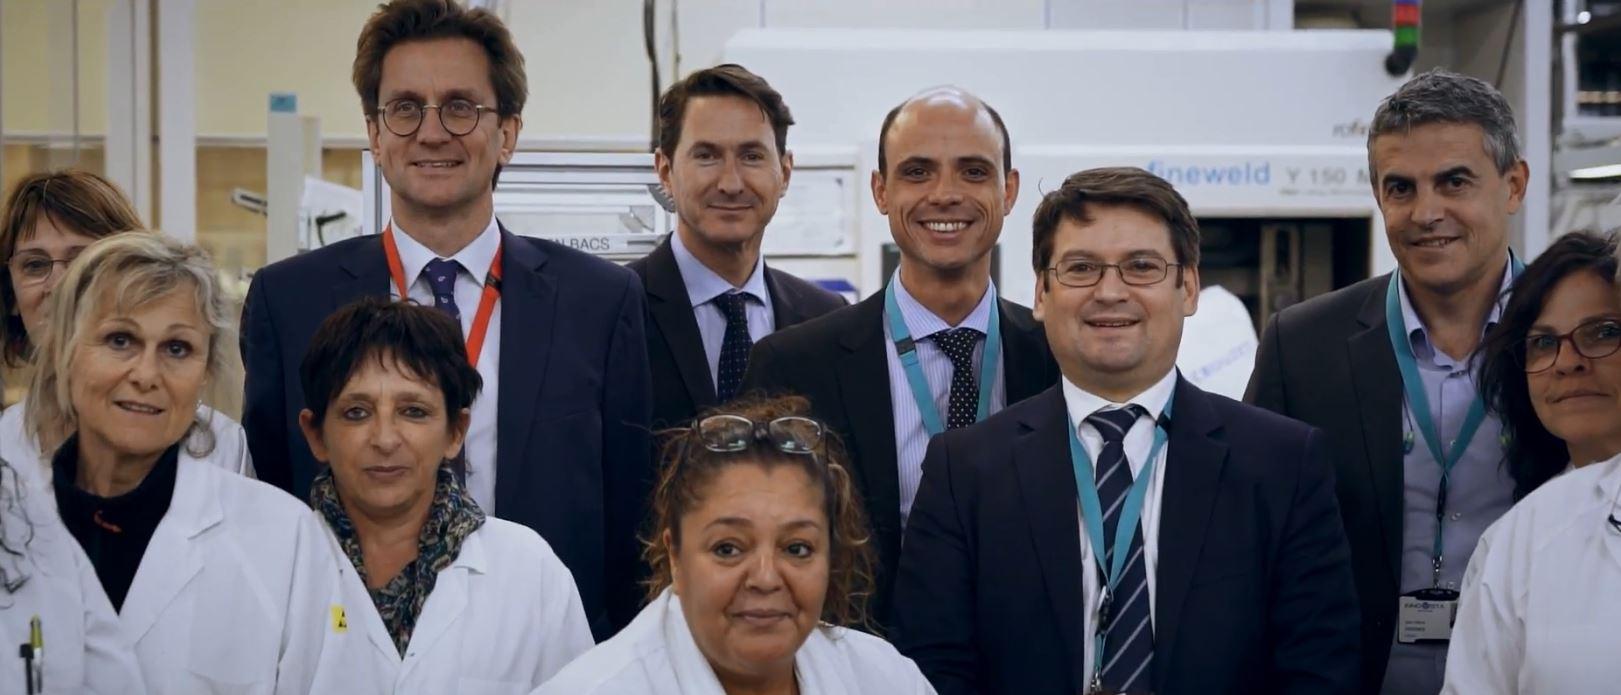 Boeing's visit to Crouzet